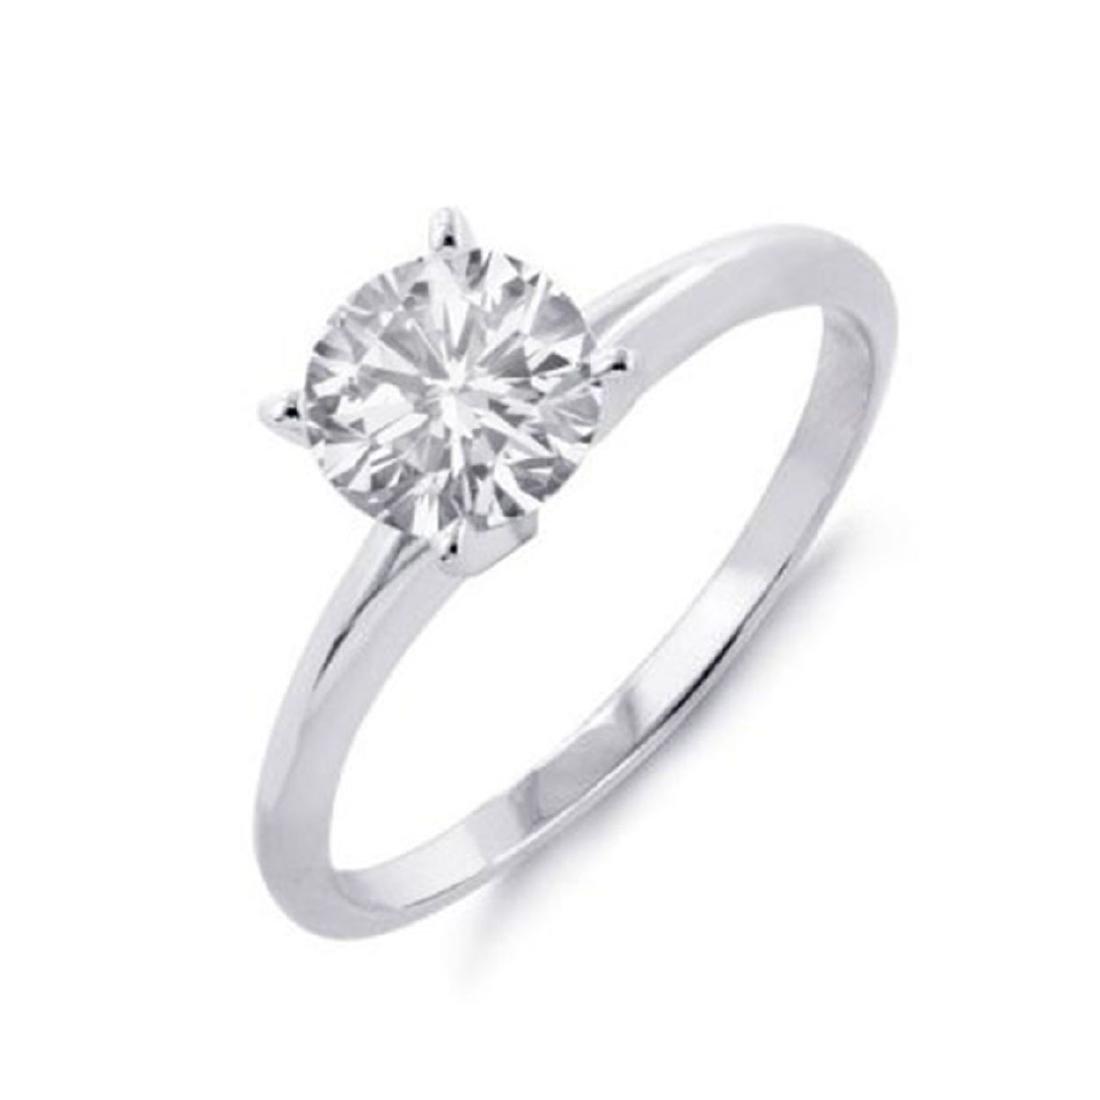 0.25 ctw VS/SI Diamond Solitaire Ring 18K White Gold -